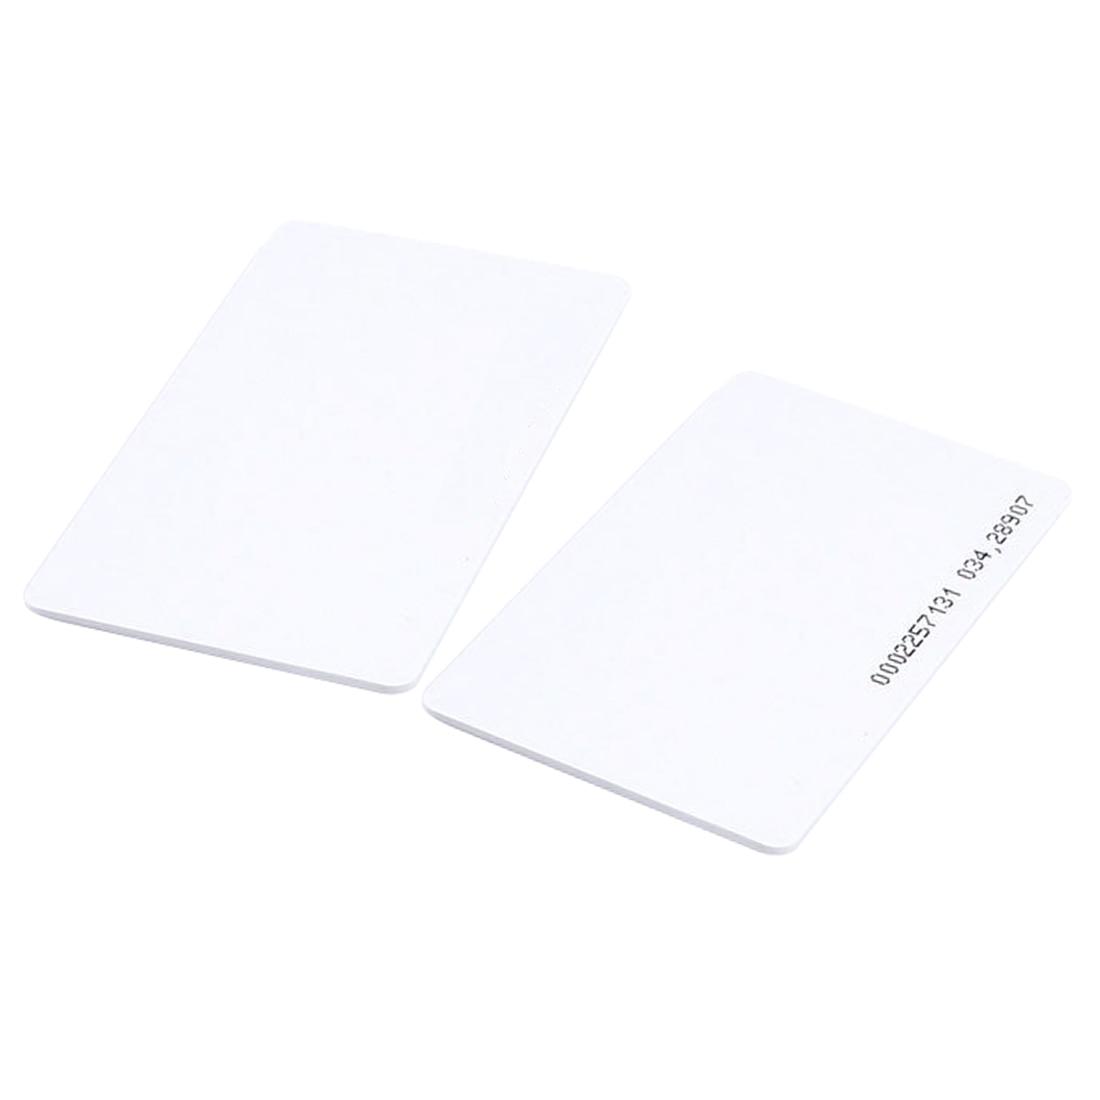 5 Packs 50 pieces Intelligent Proximity EM4100 125kHz RFID Proximity Card Entry Empty ID Access